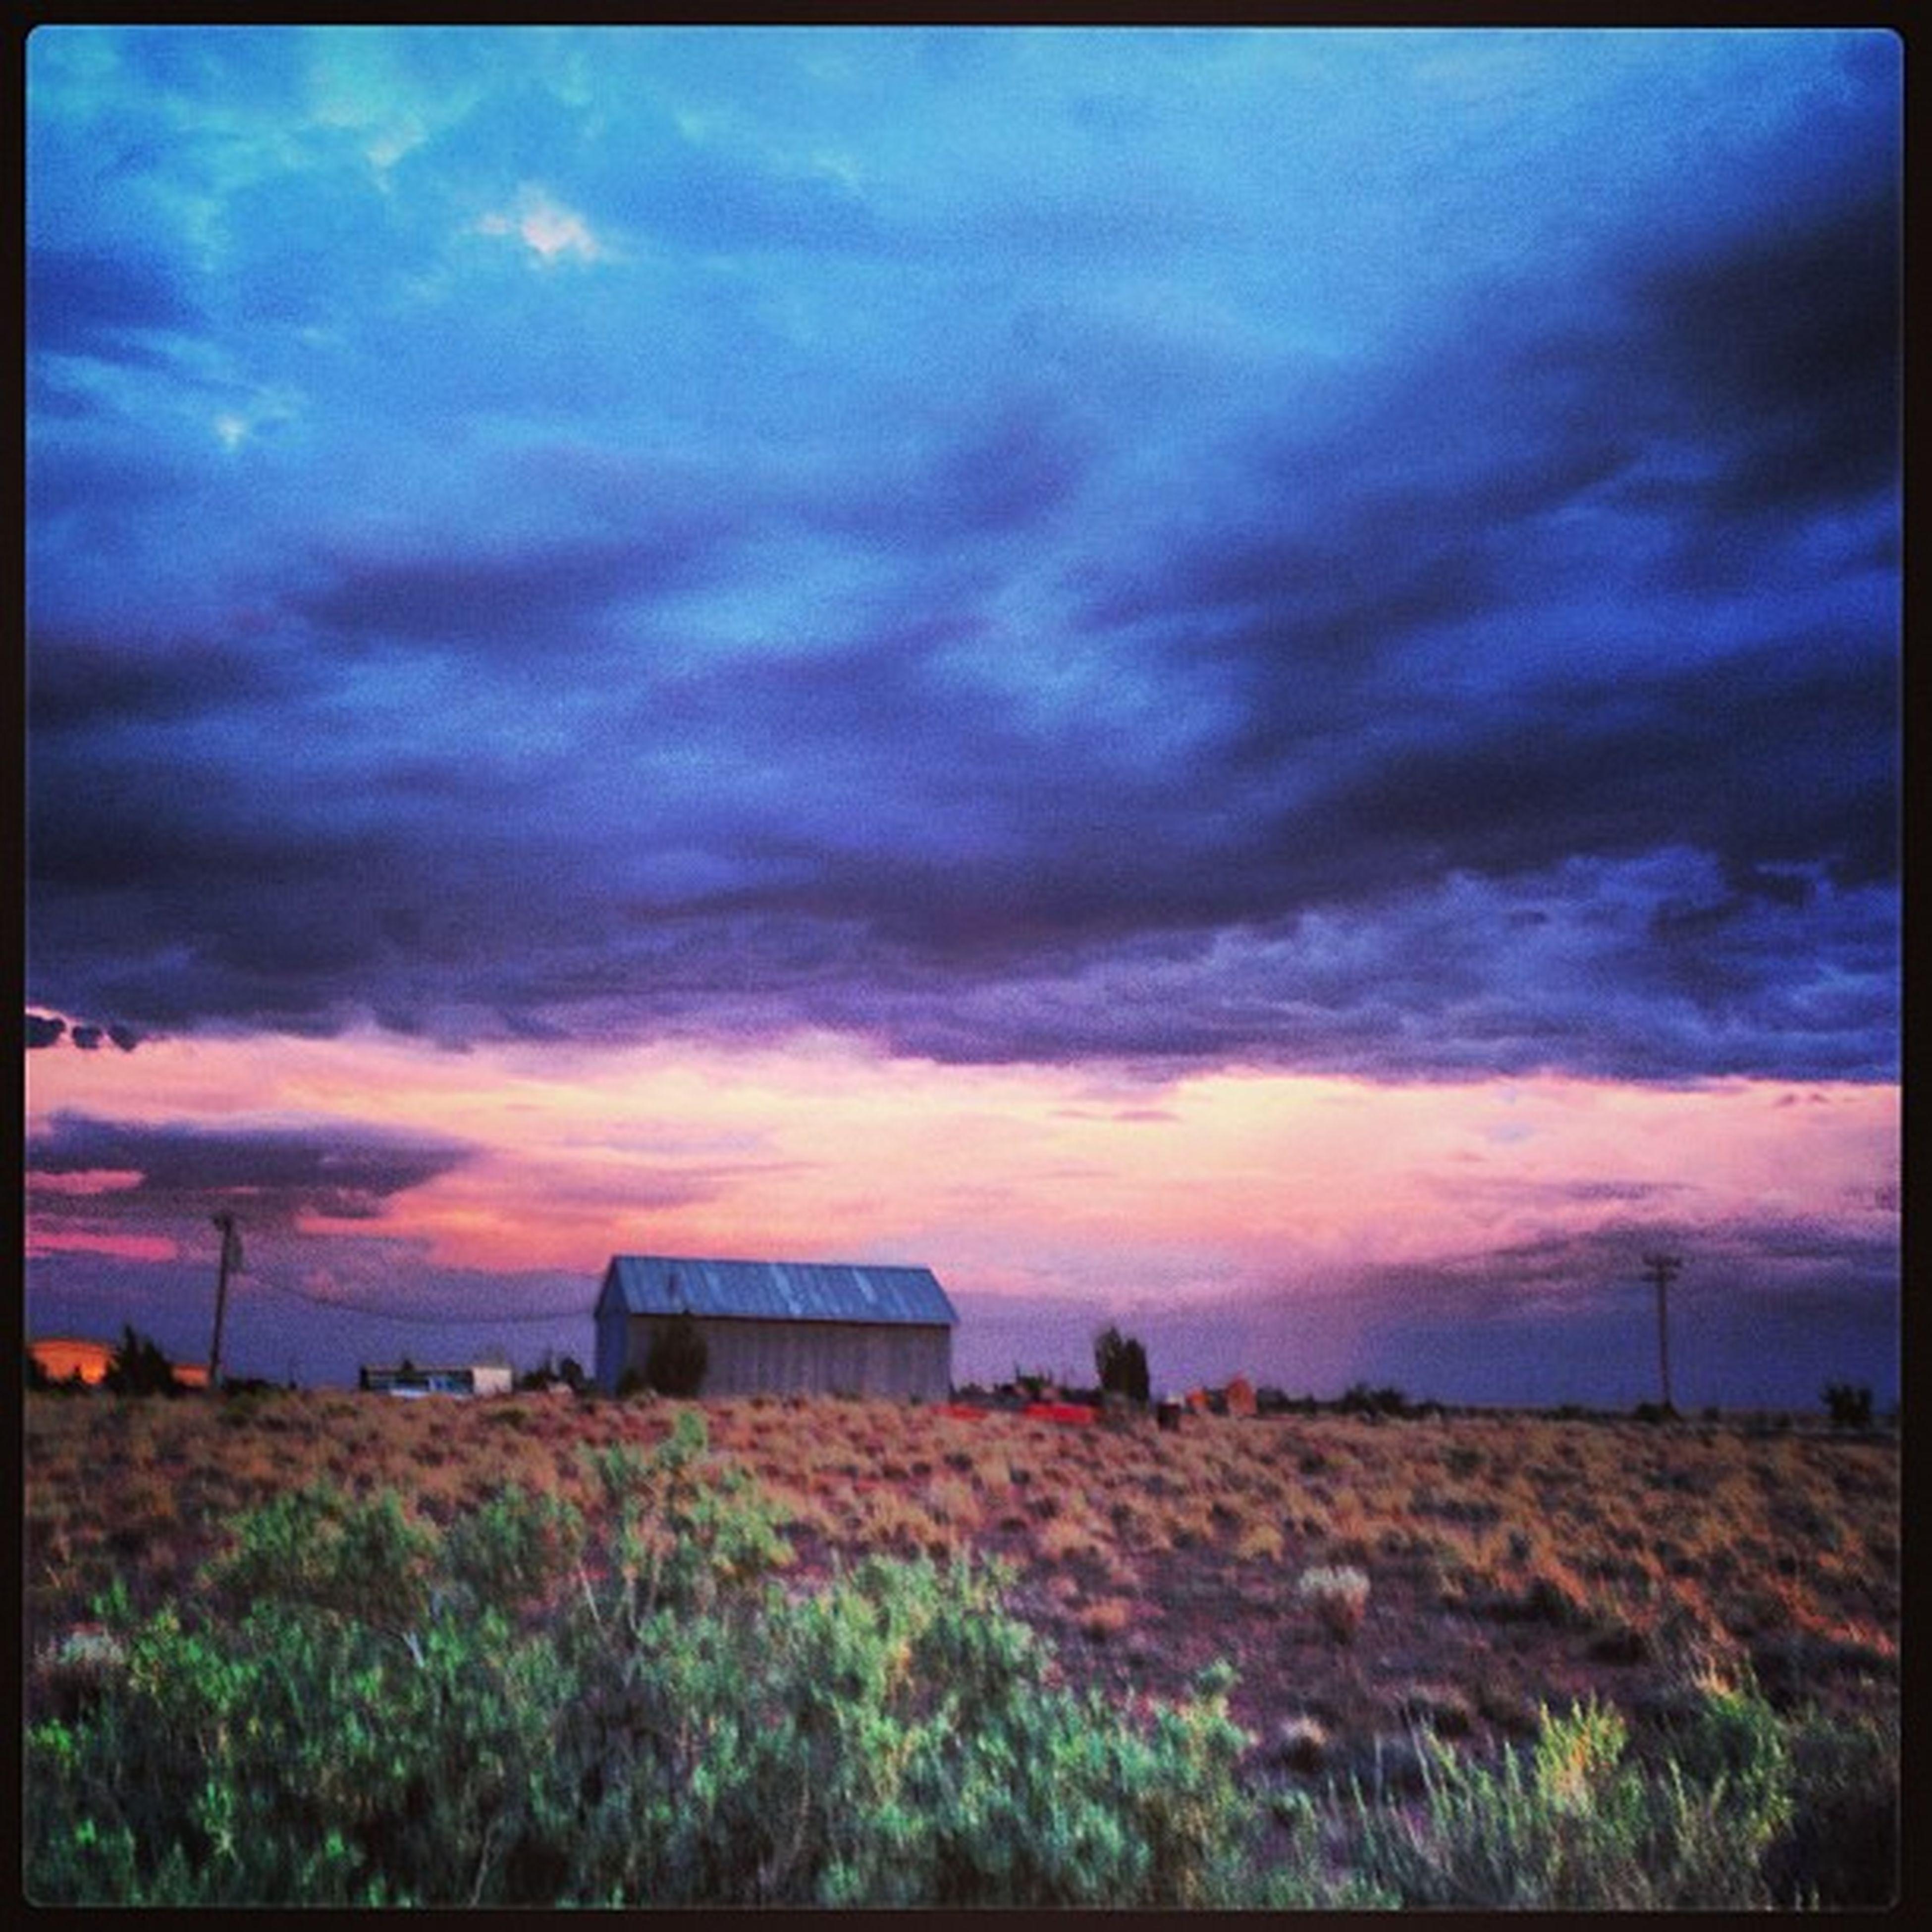 Pinknblue Purplenpink Greenfoliage Field clouds cloudy country countryrd countryroad barn farmhome az arizona azsunset arizonasunset holbrook holbrookaz josephcity mclawsrd cattlerunrd